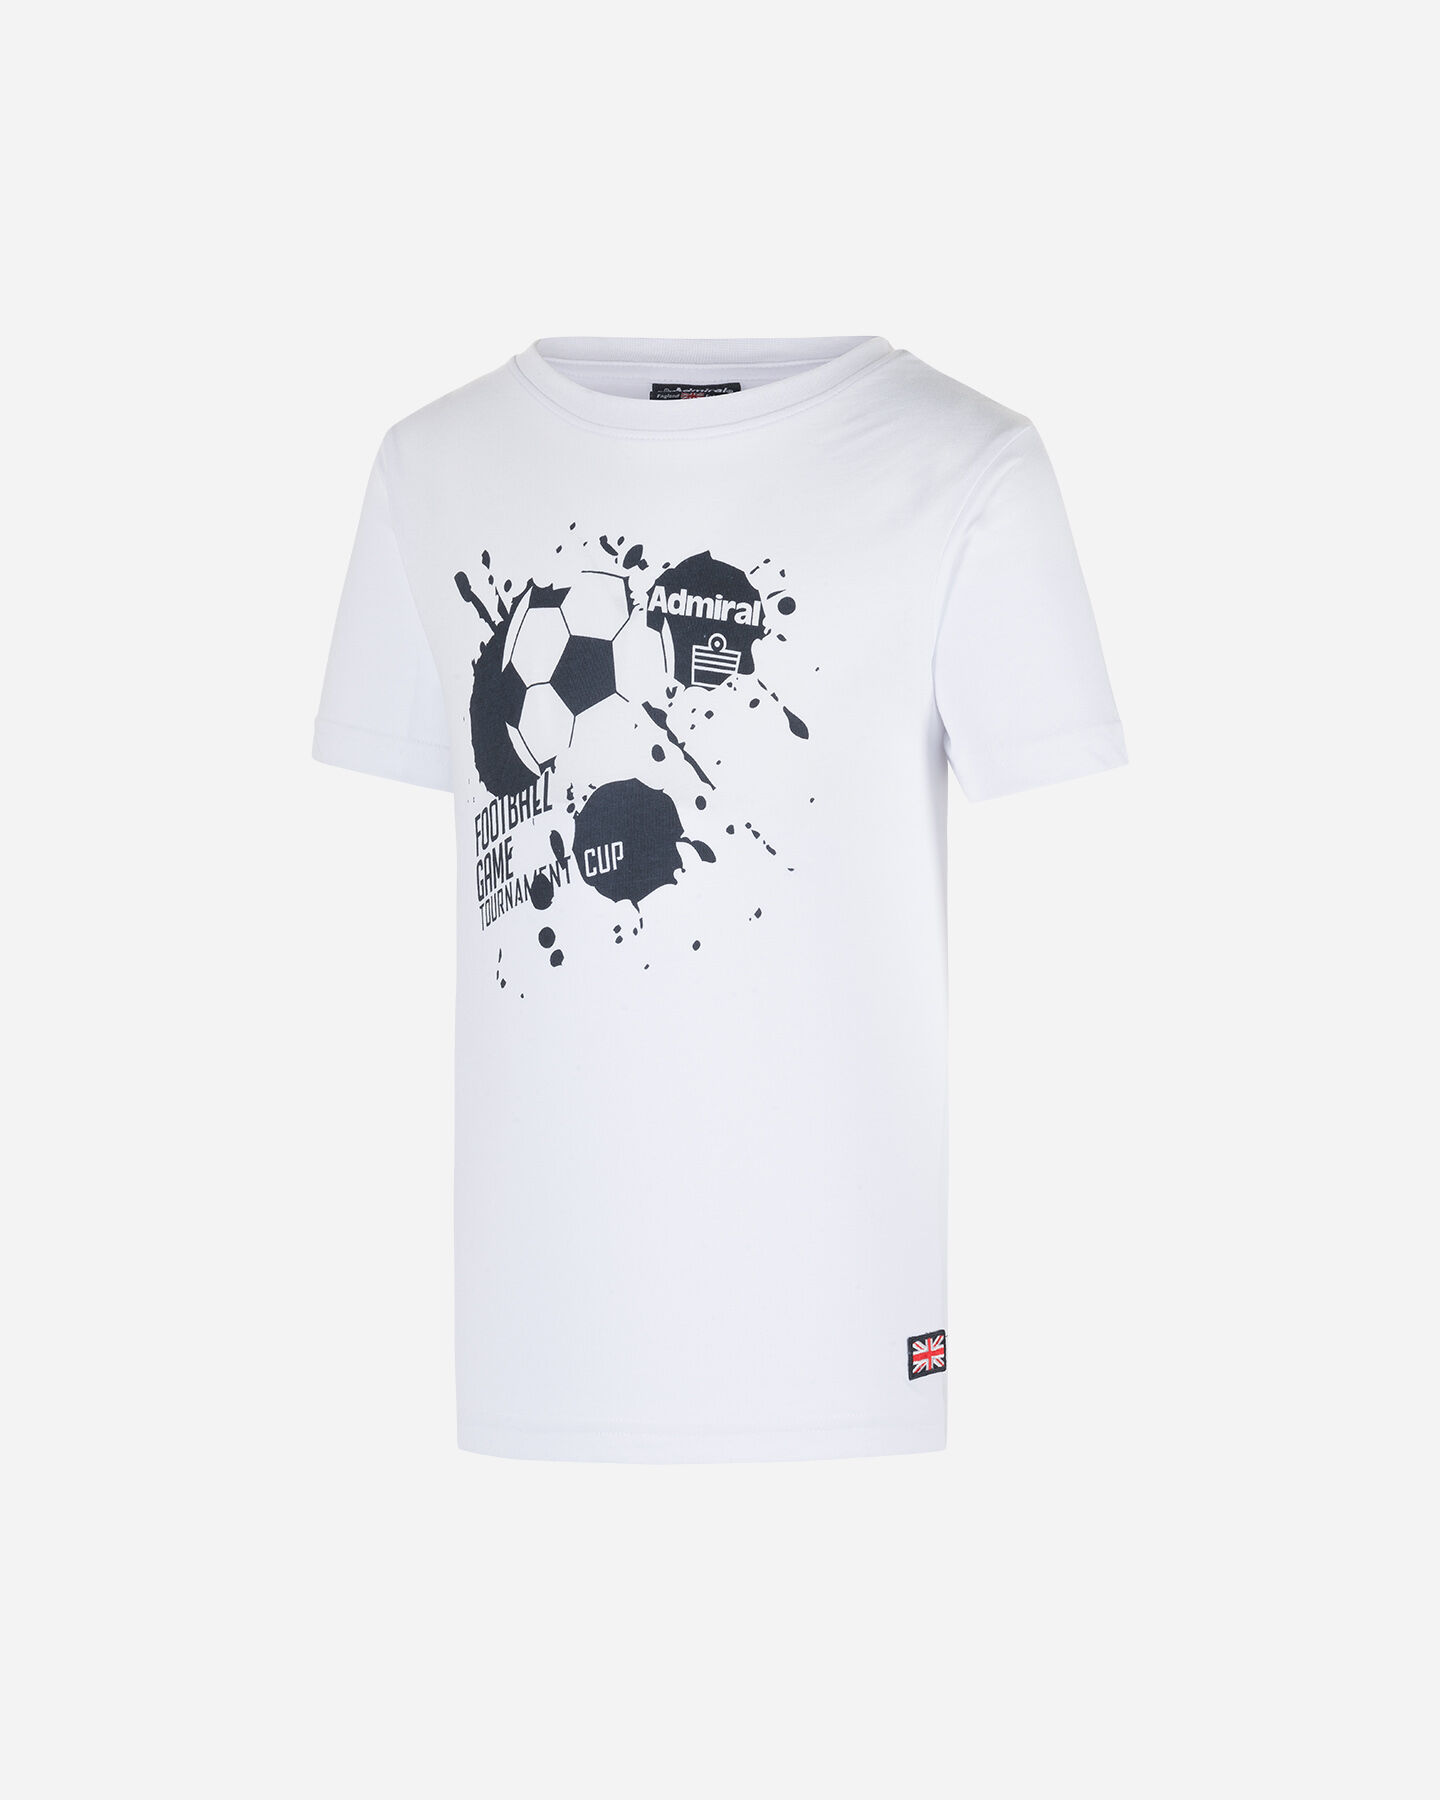 T-Shirt ADMIRAL KICK SPLASH JR S4075694 scatto 0